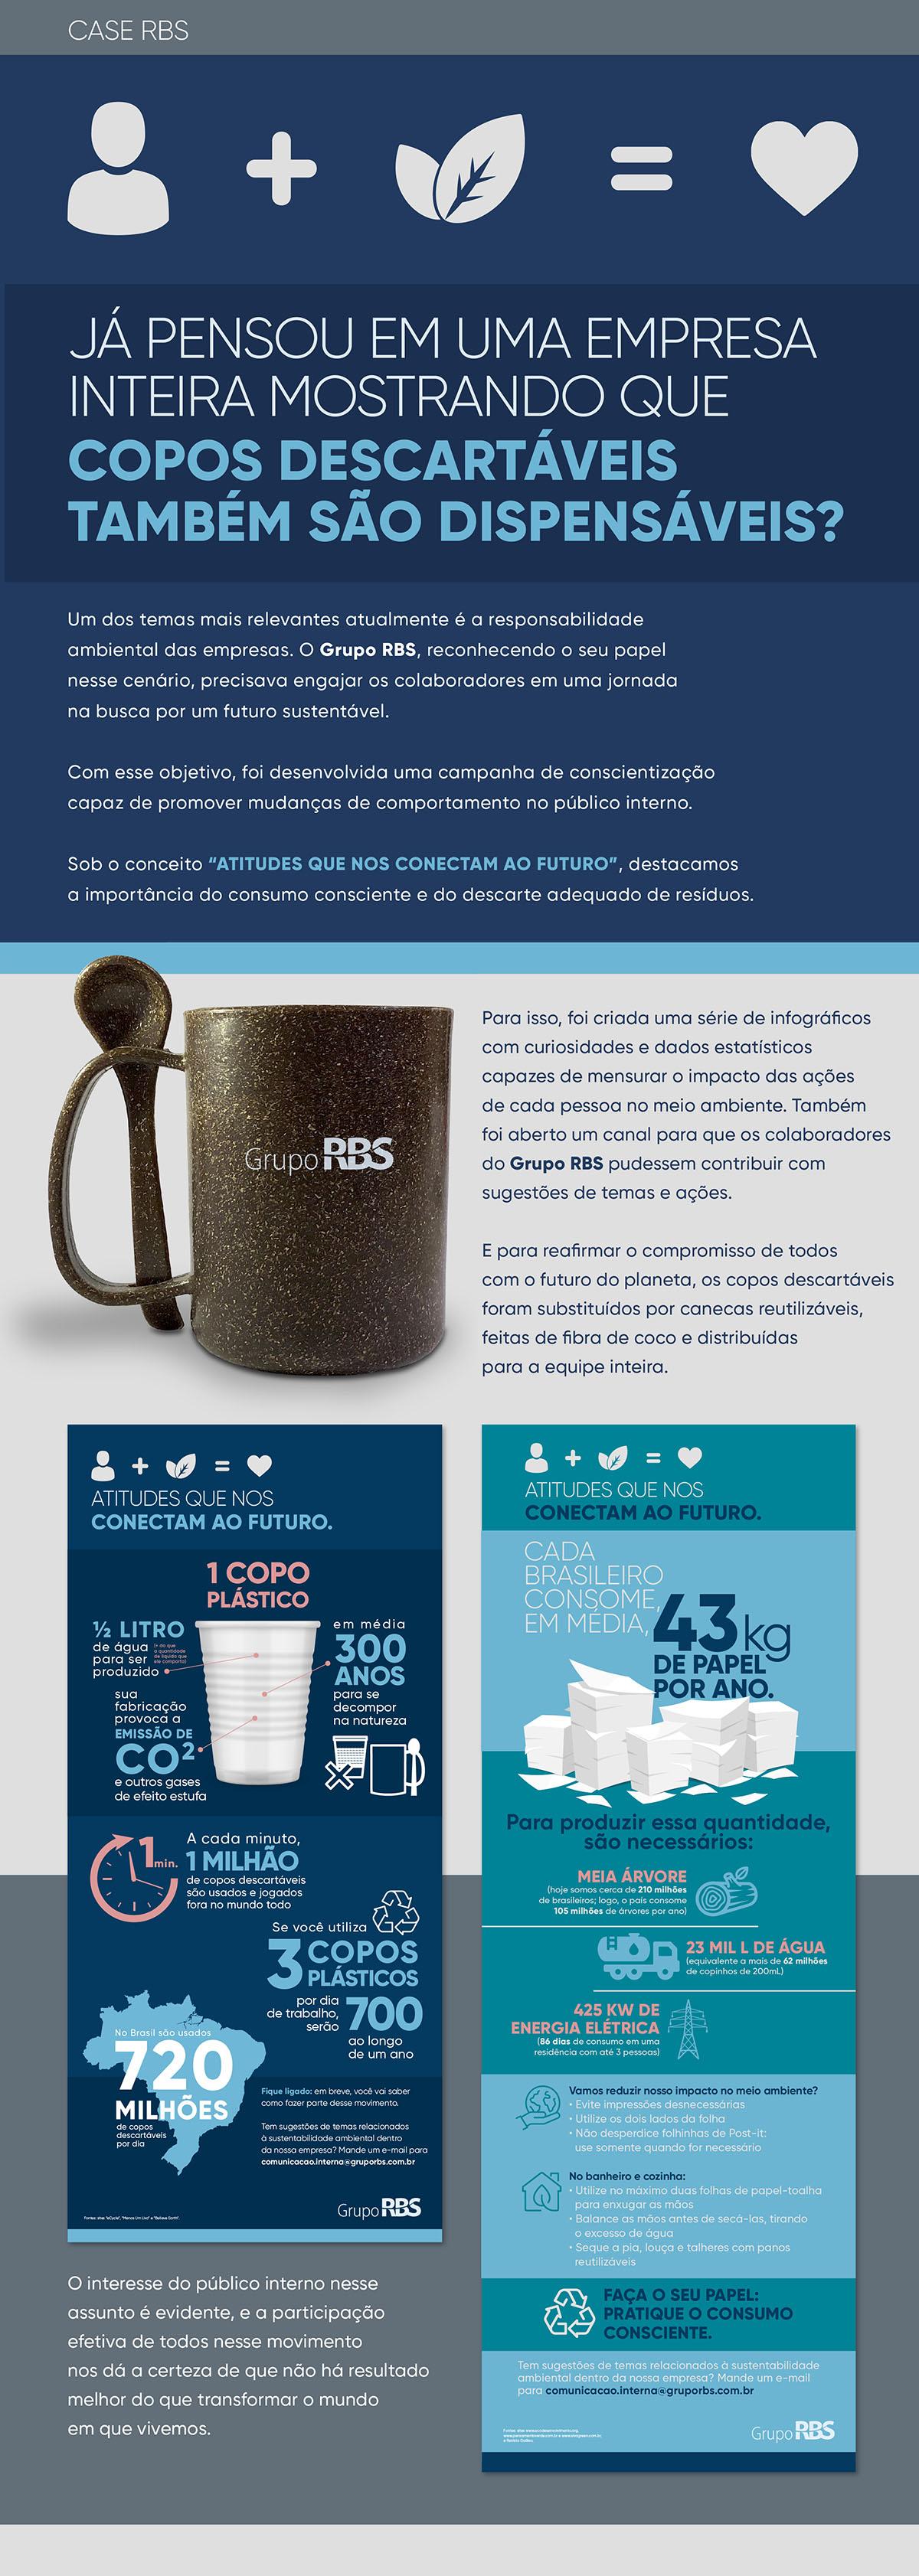 case RBS Sustentabilidade-01.jpg